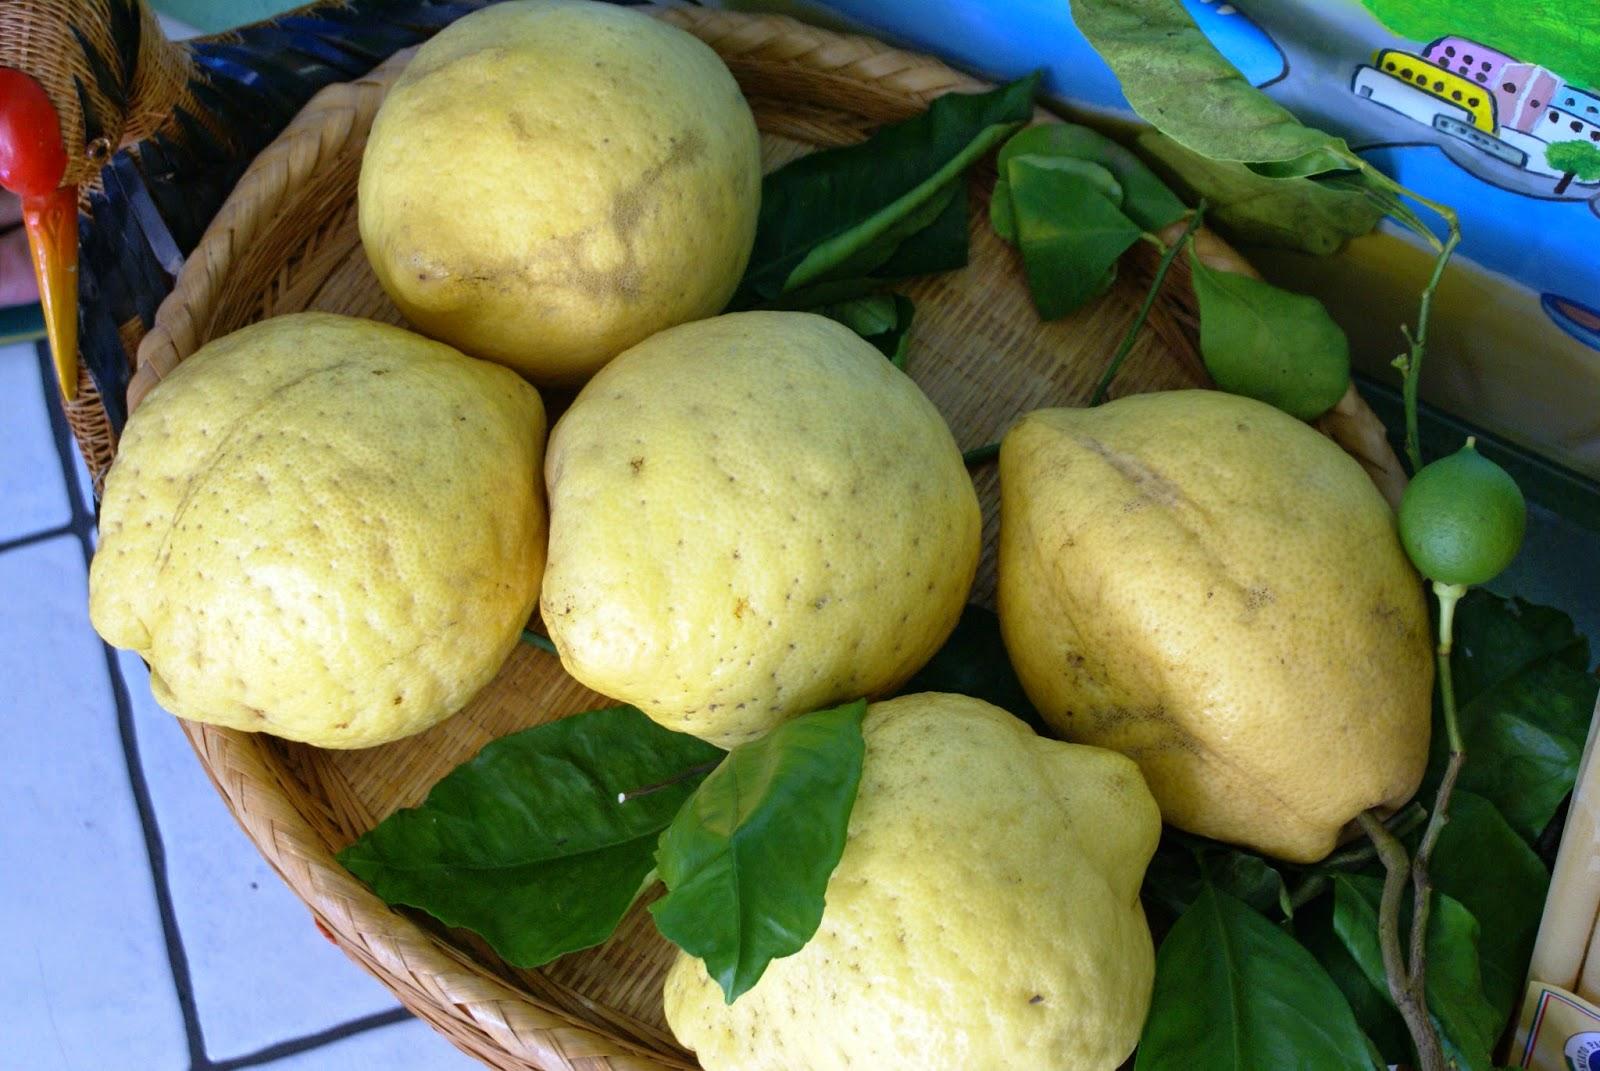 Lemons in Ischia, Italy